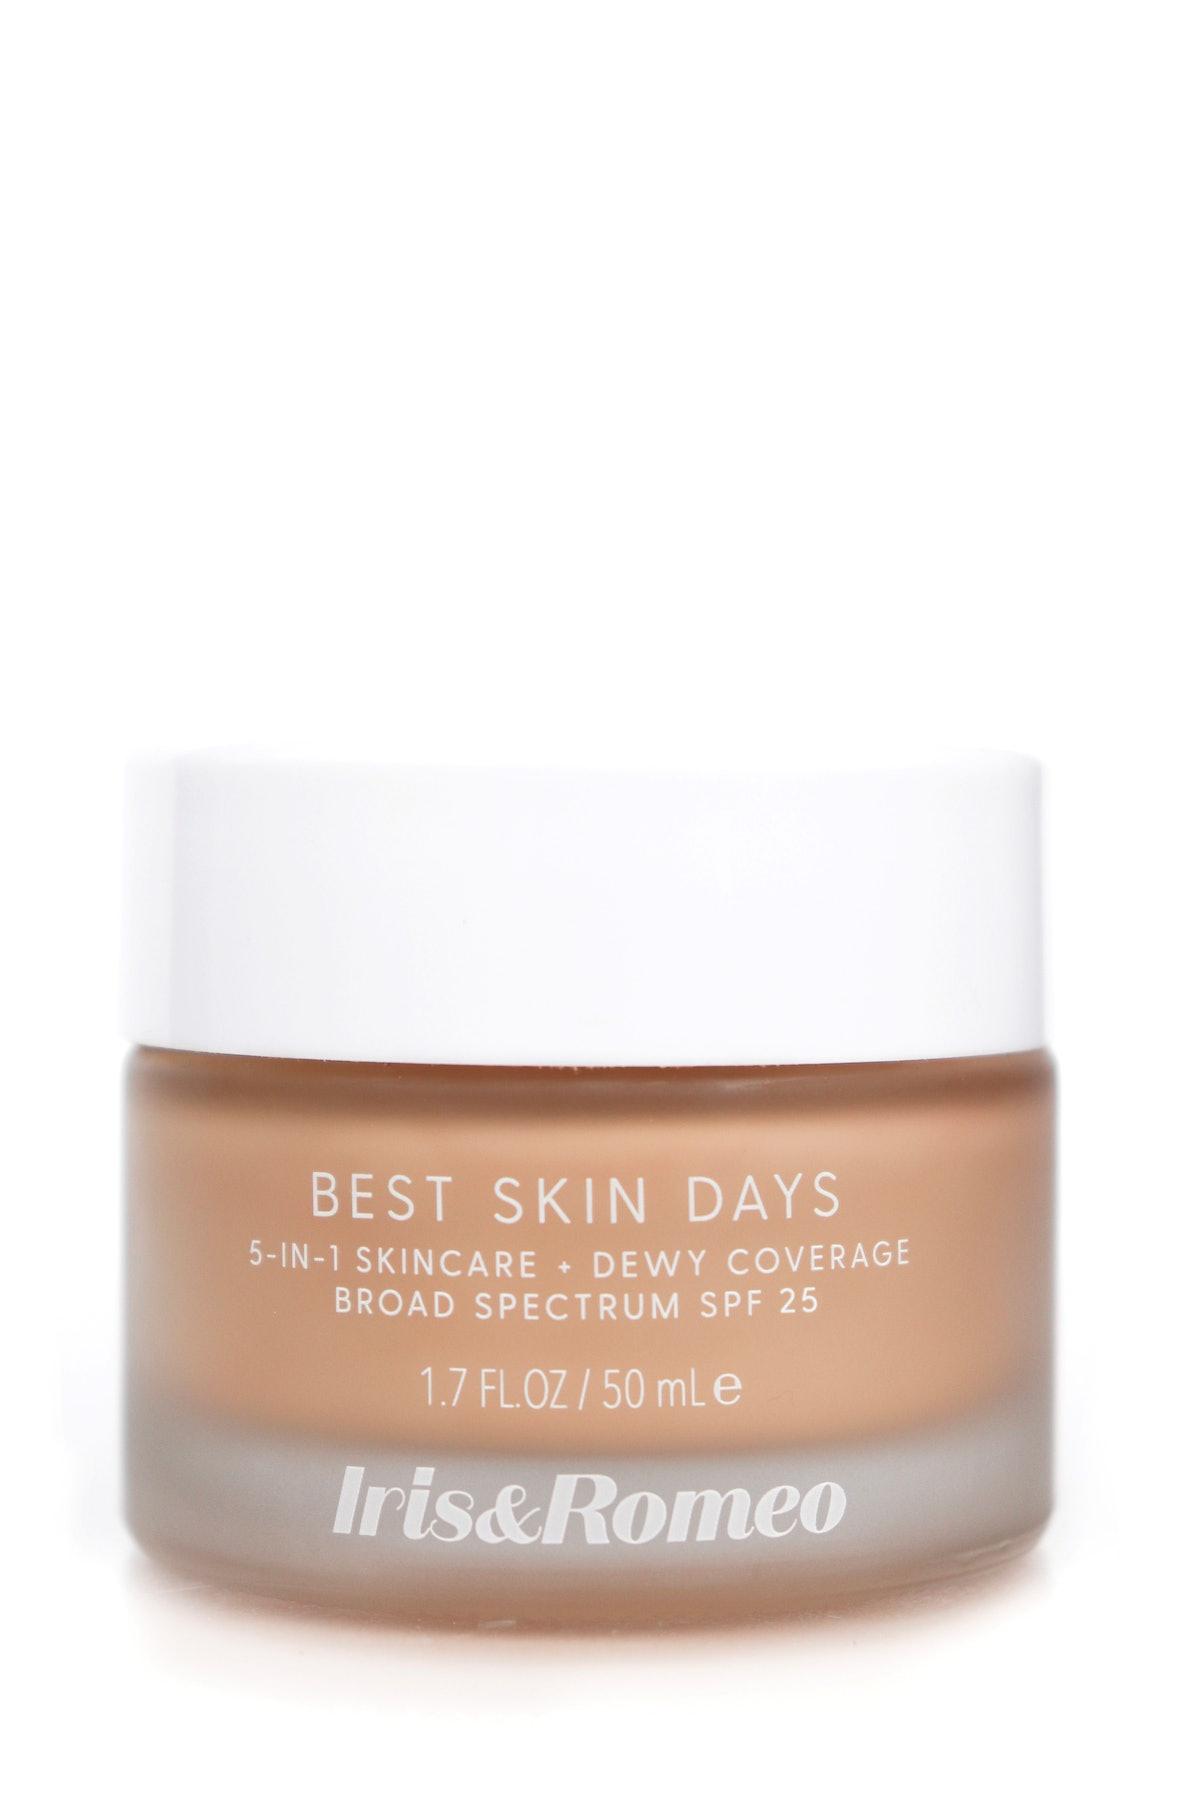 Best Skin Days 5-in-1 Skincare + Dewy Coverage Broad Spectrum SPF 25